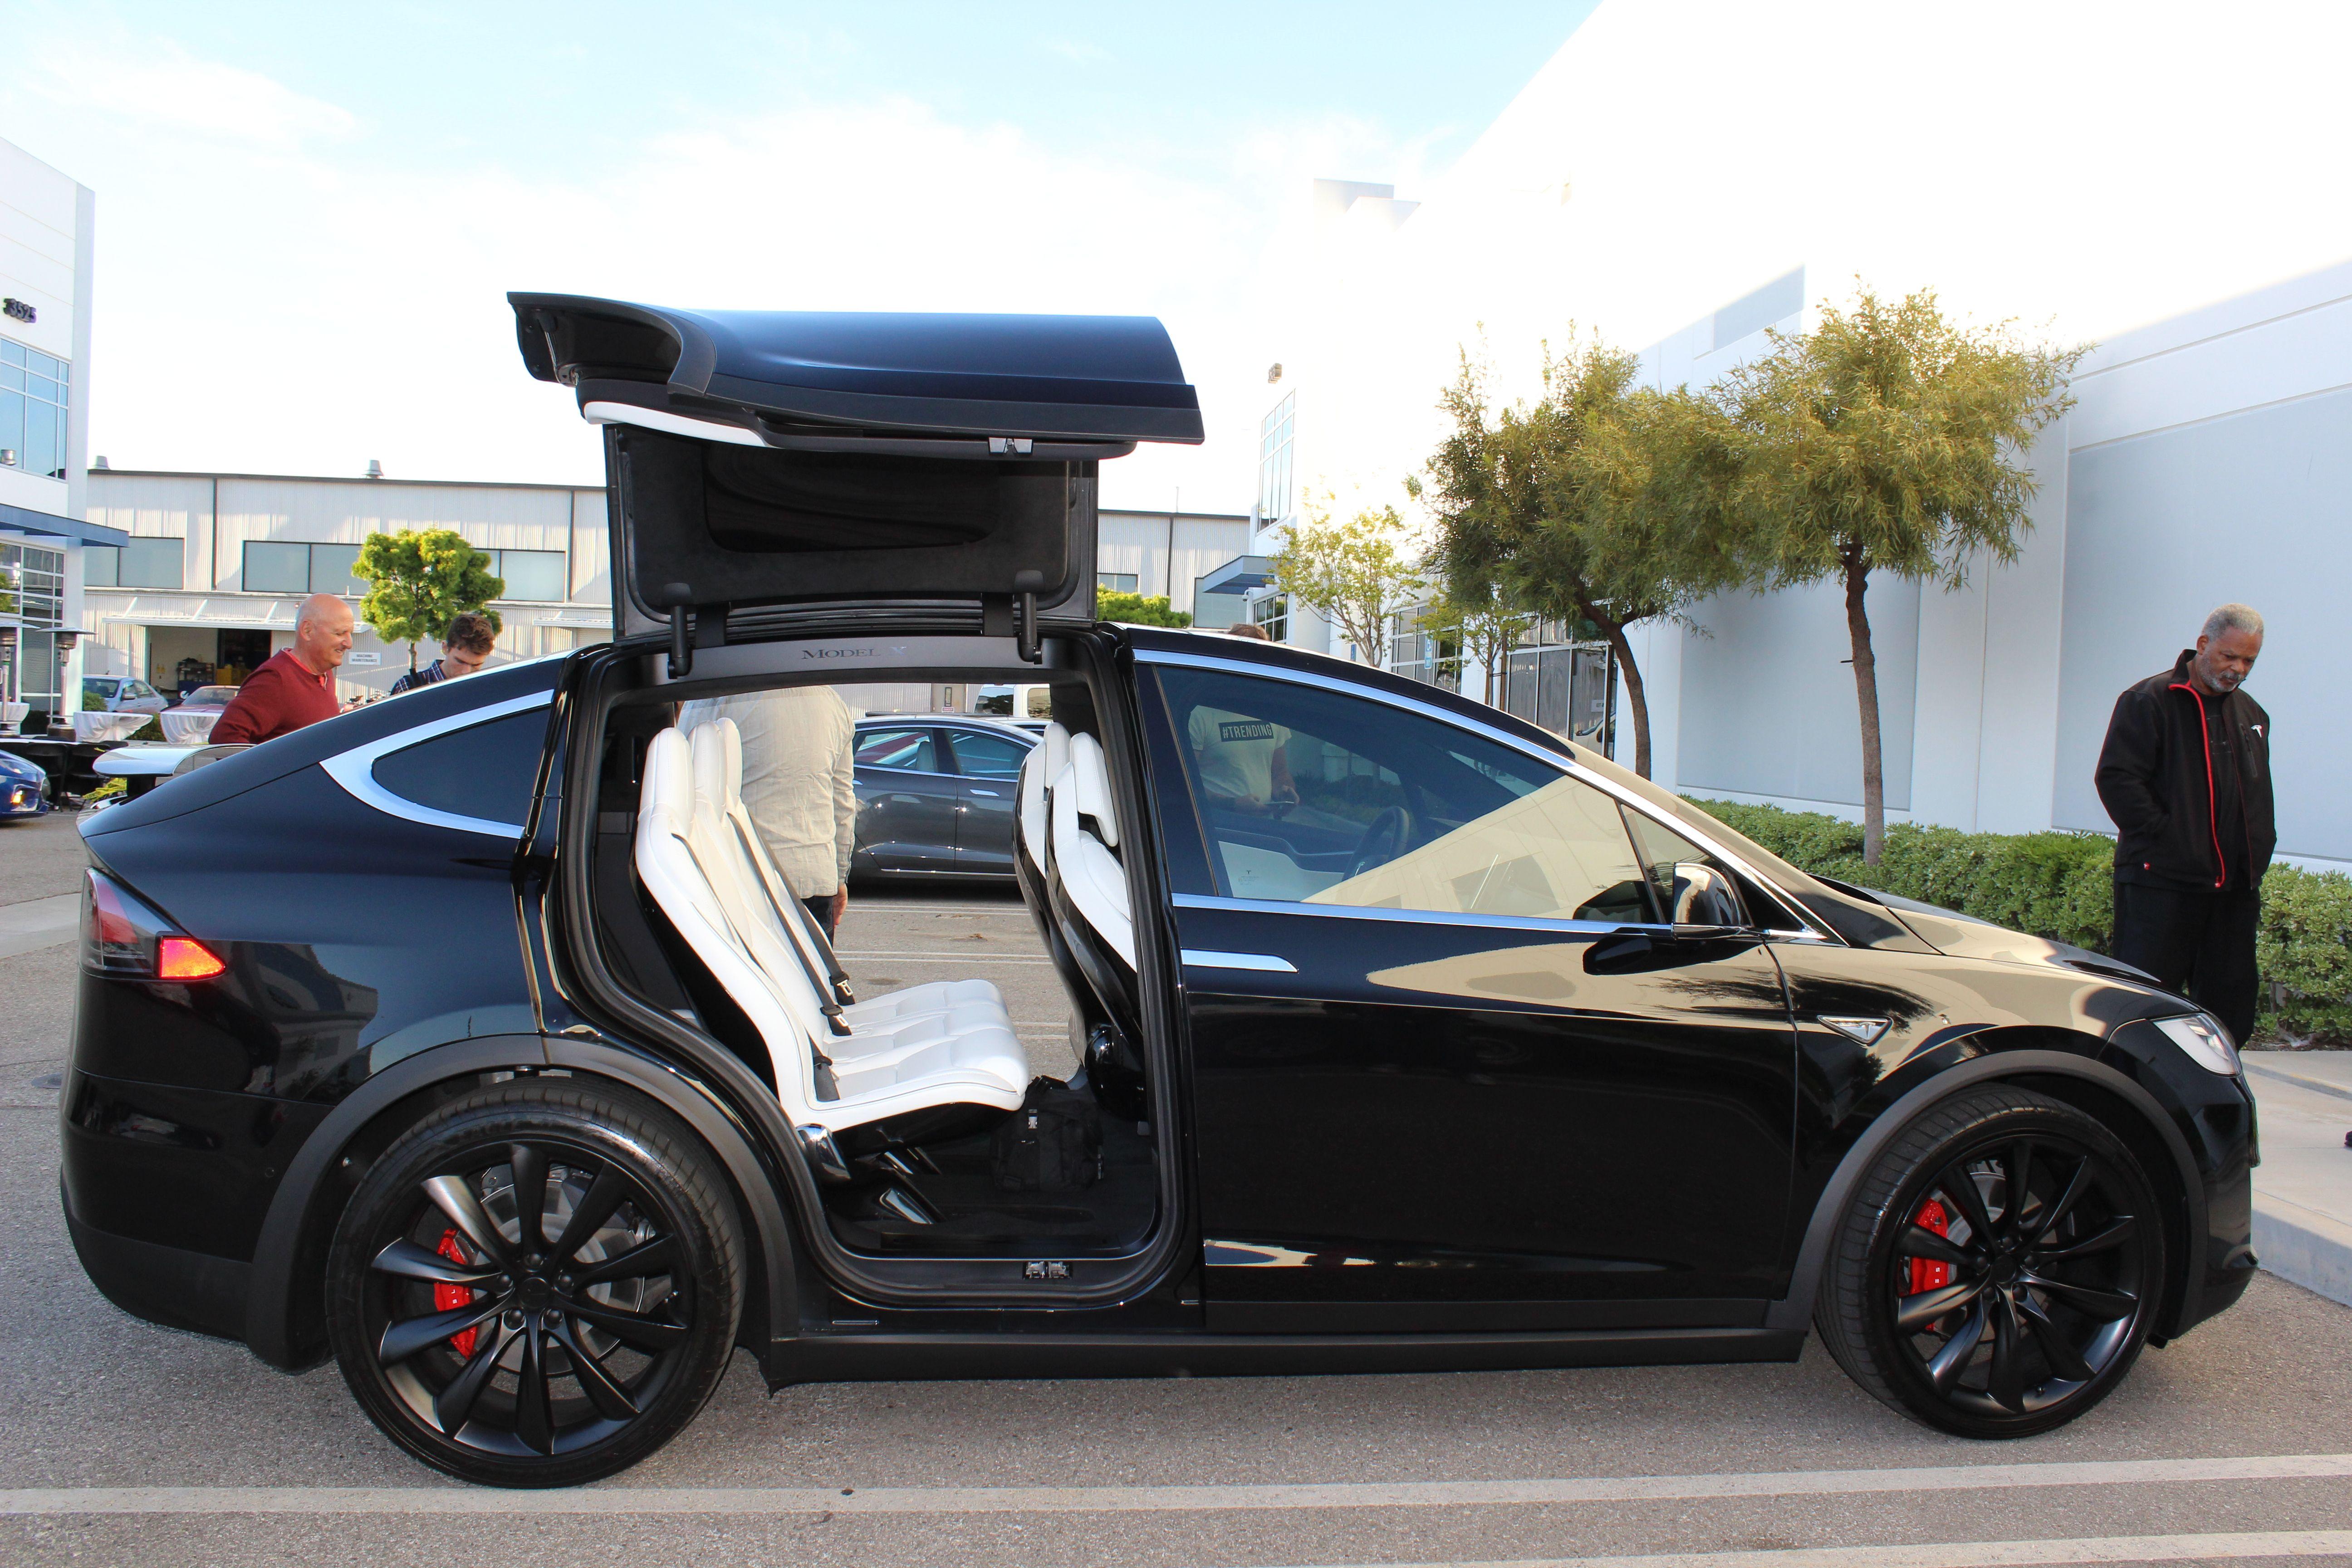 Spotted Brand New Tesla Model Xs Outside Secret Apple Car Autonomous Driving Office Best Suv Tesla Model X Best Midsize Suv